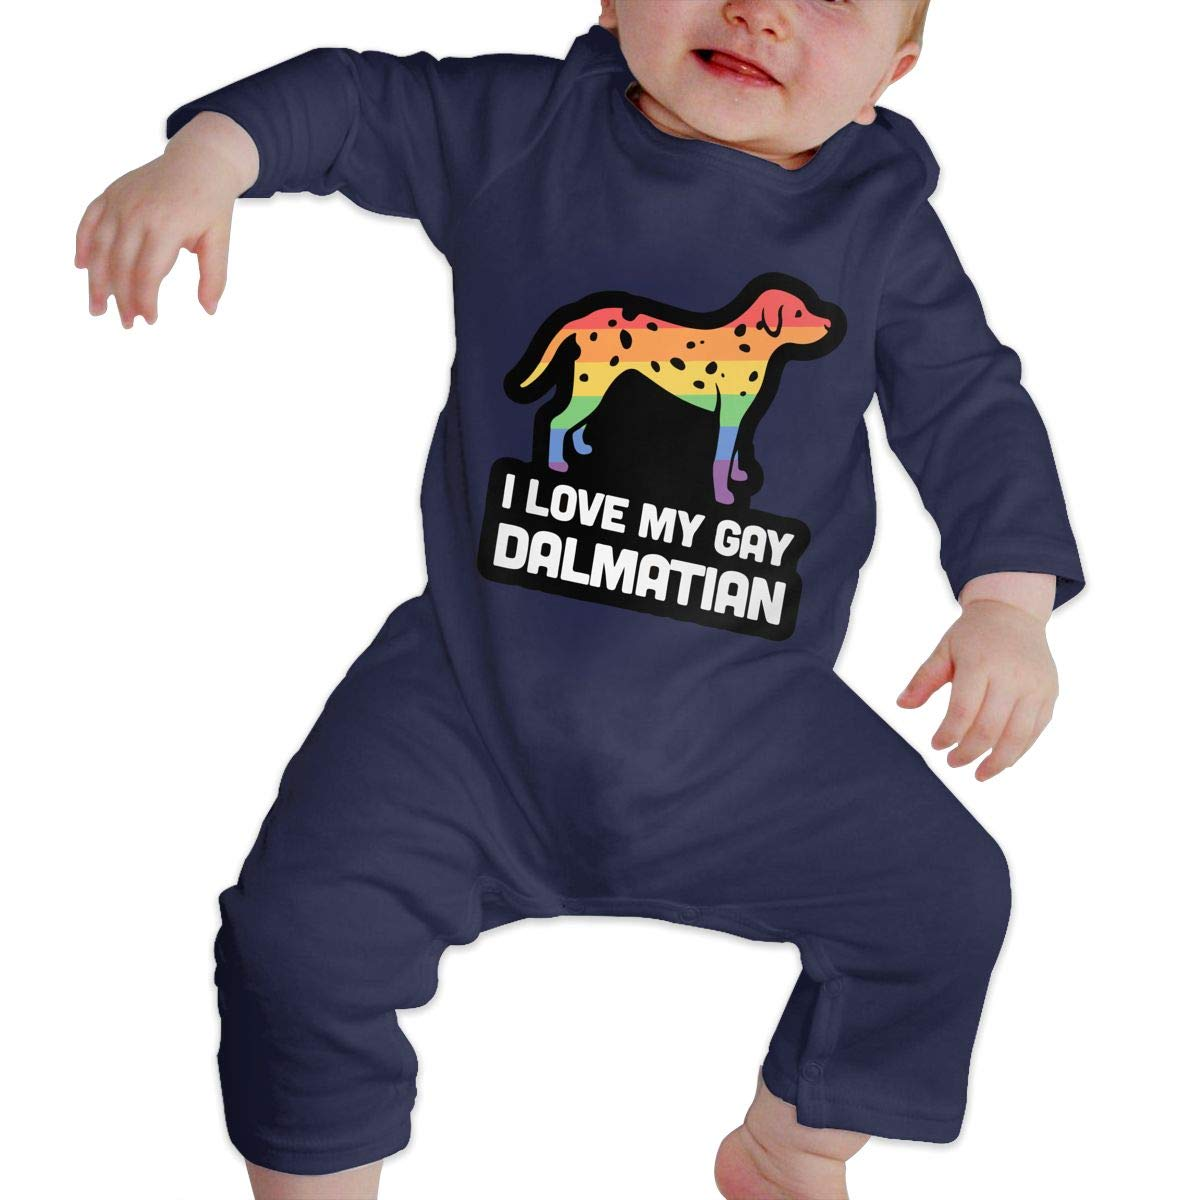 Mri-le1 Toddler Baby Boy Girl Bodysuits Dalmatian Gay Dog LGBT Pride Toddler Jumpsuit